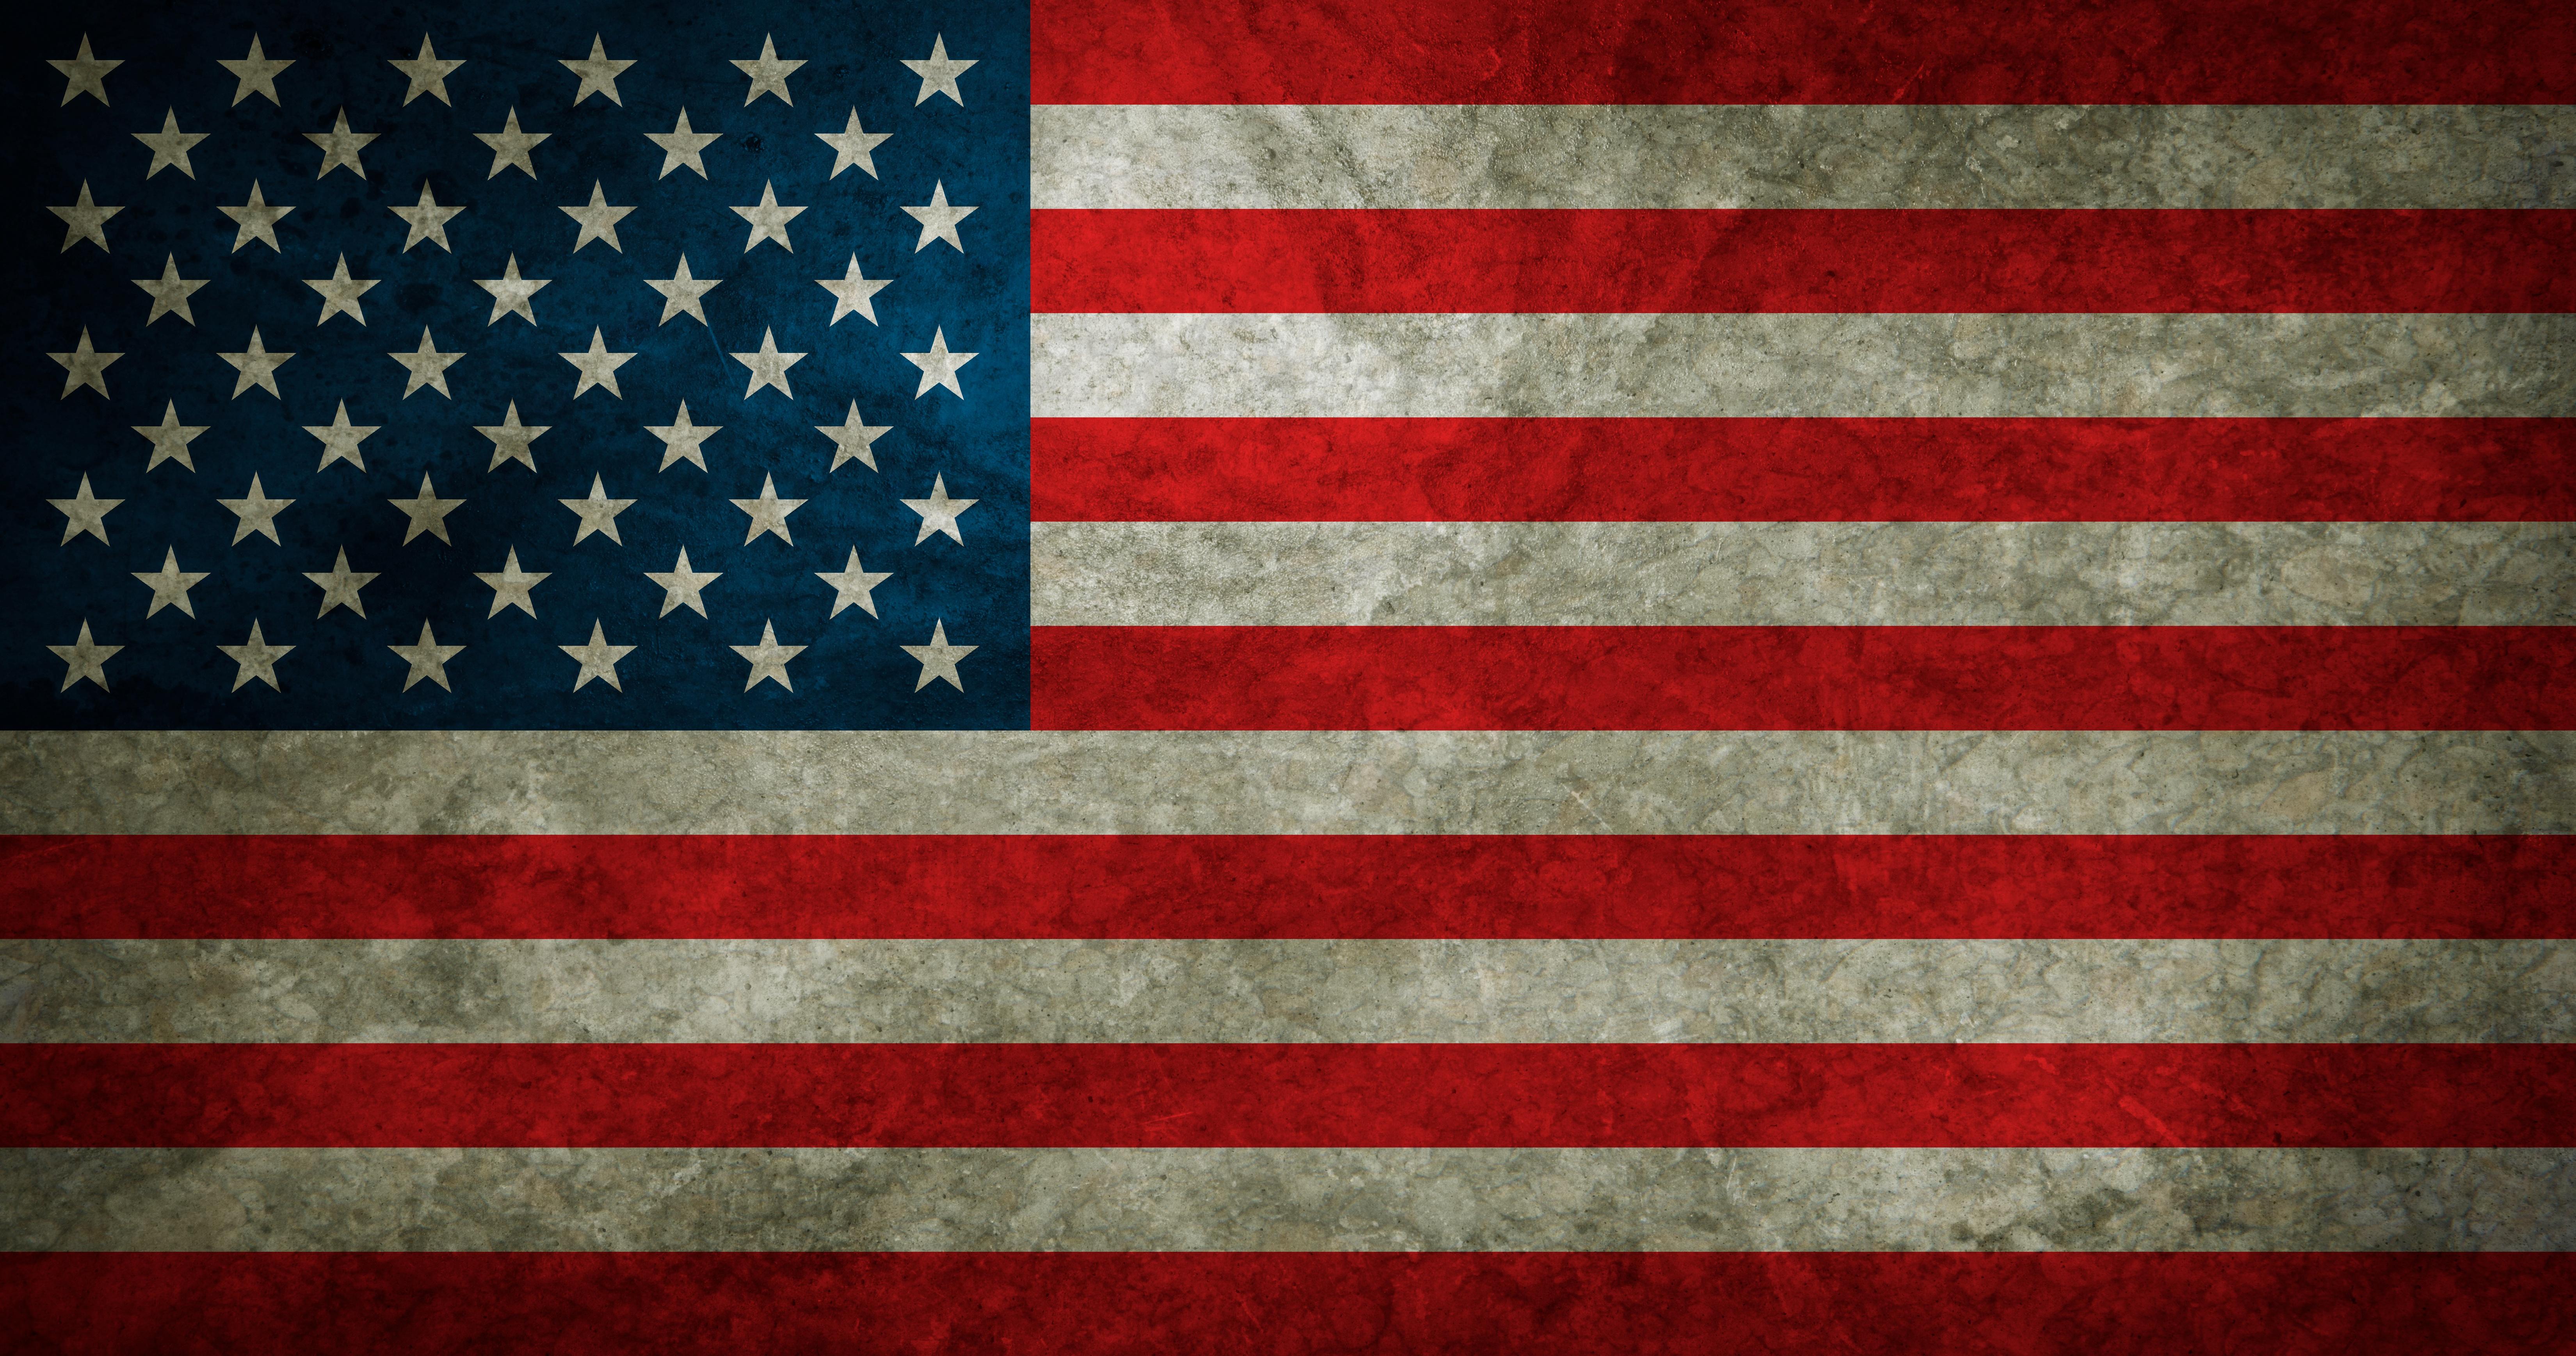 USA_Grunge_Flag